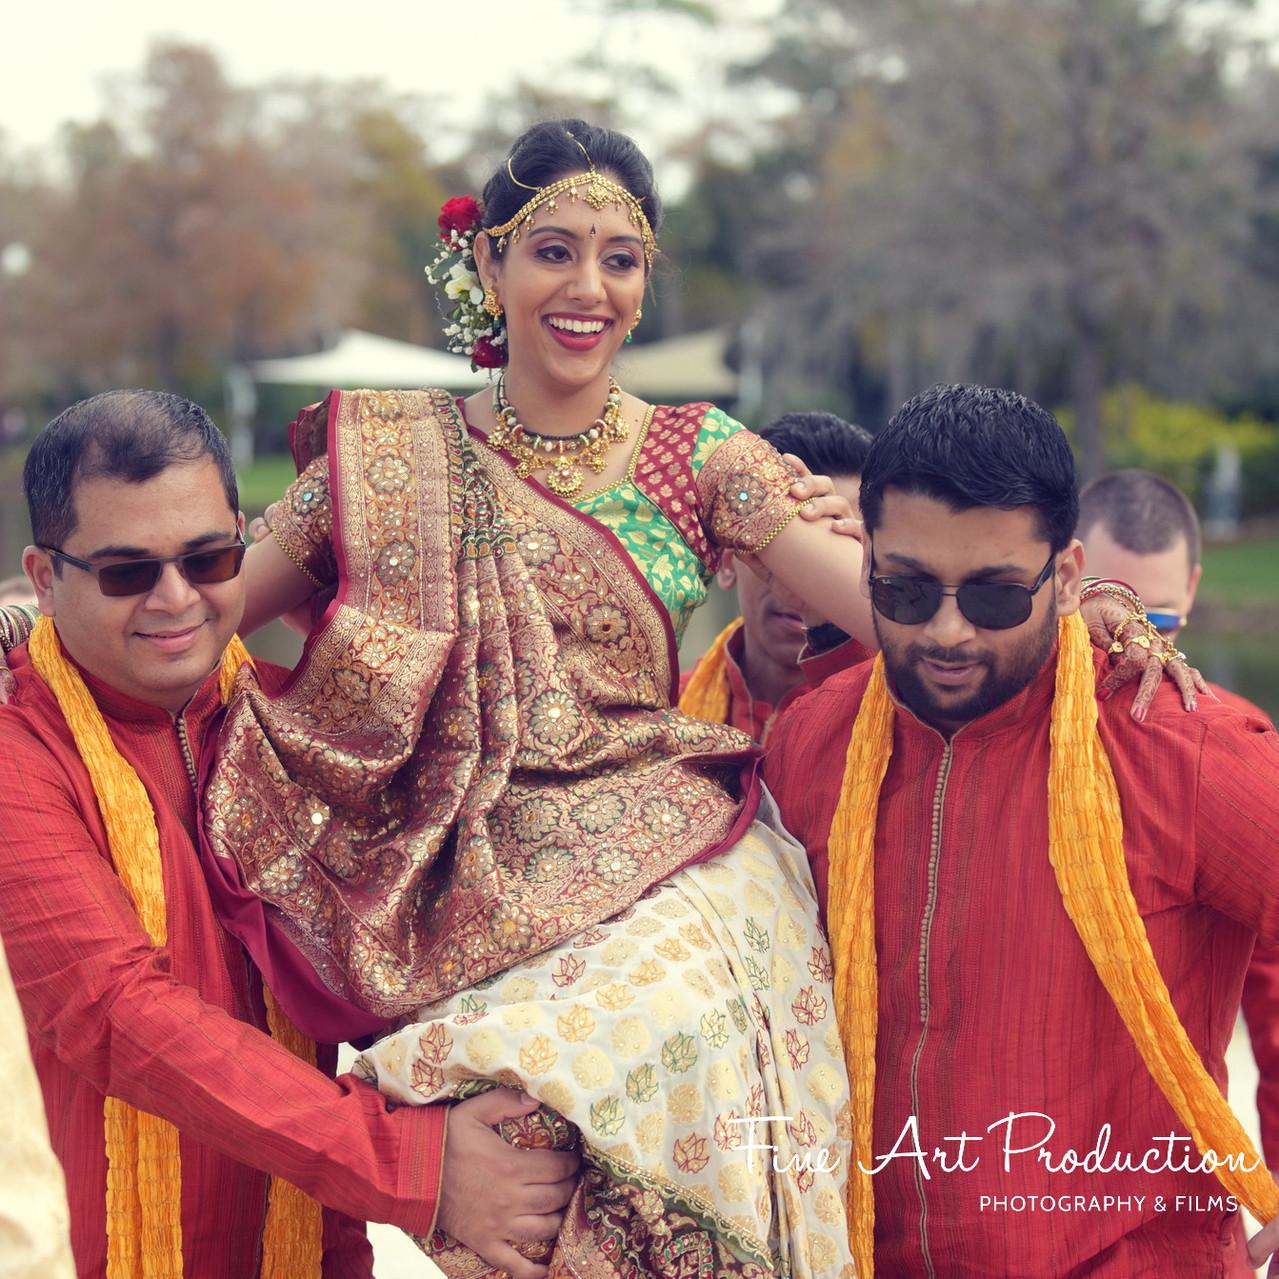 Hyatt-Regency-Grand-Cypress-Indian-Wedding-Photography-Fine-Art-Production-Amish-Thakkar_33